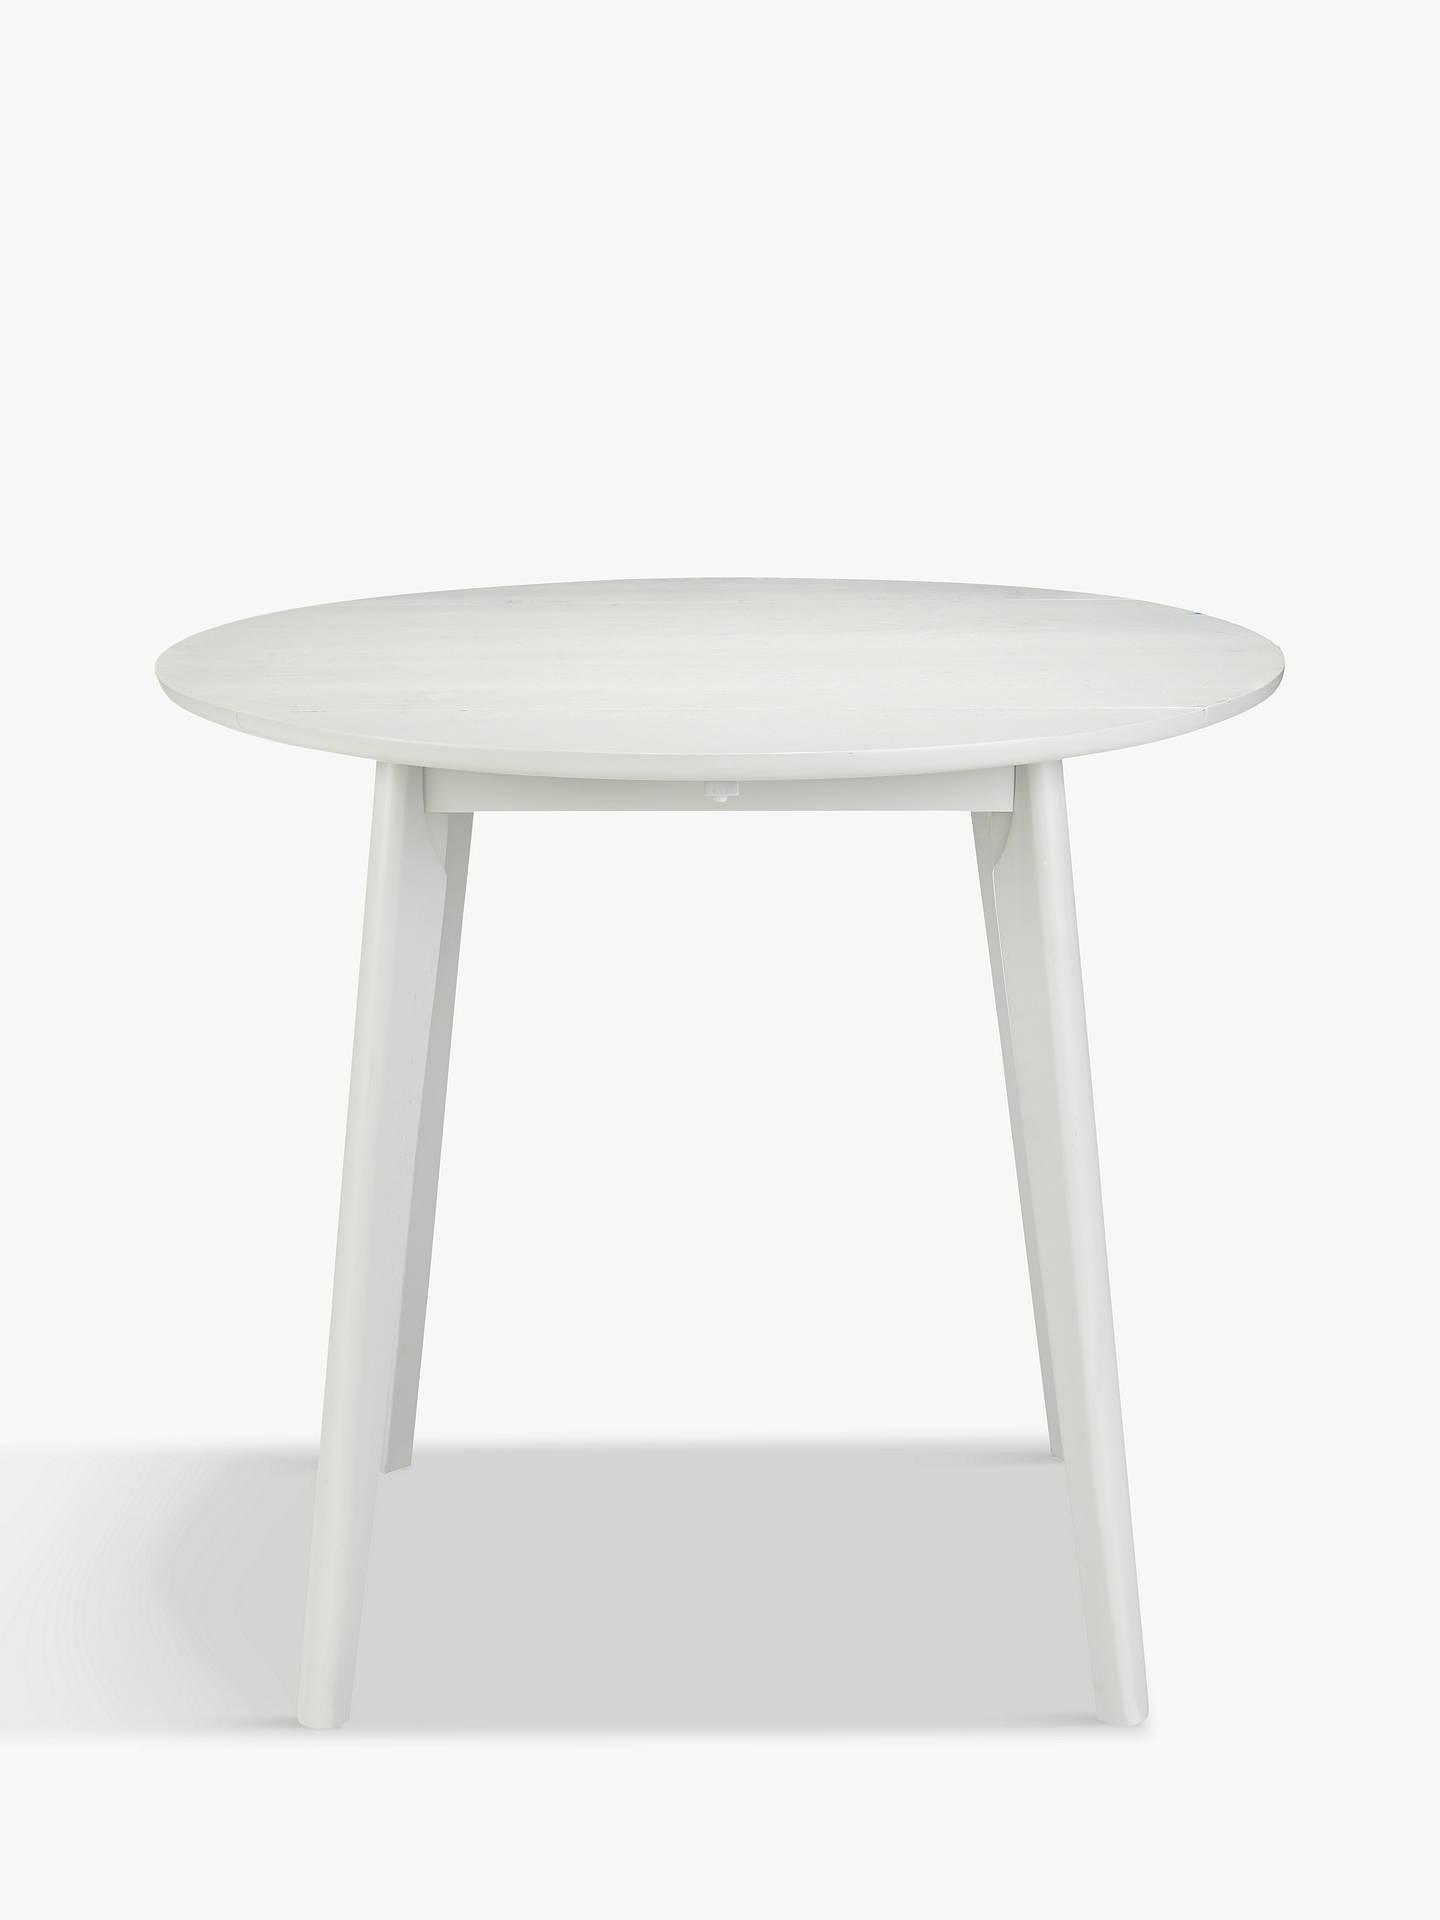 Outstanding House By John Lewis Dillon 4 Seater Drop Leaf Dining Table Smoke Grey Inzonedesignstudio Interior Chair Design Inzonedesignstudiocom